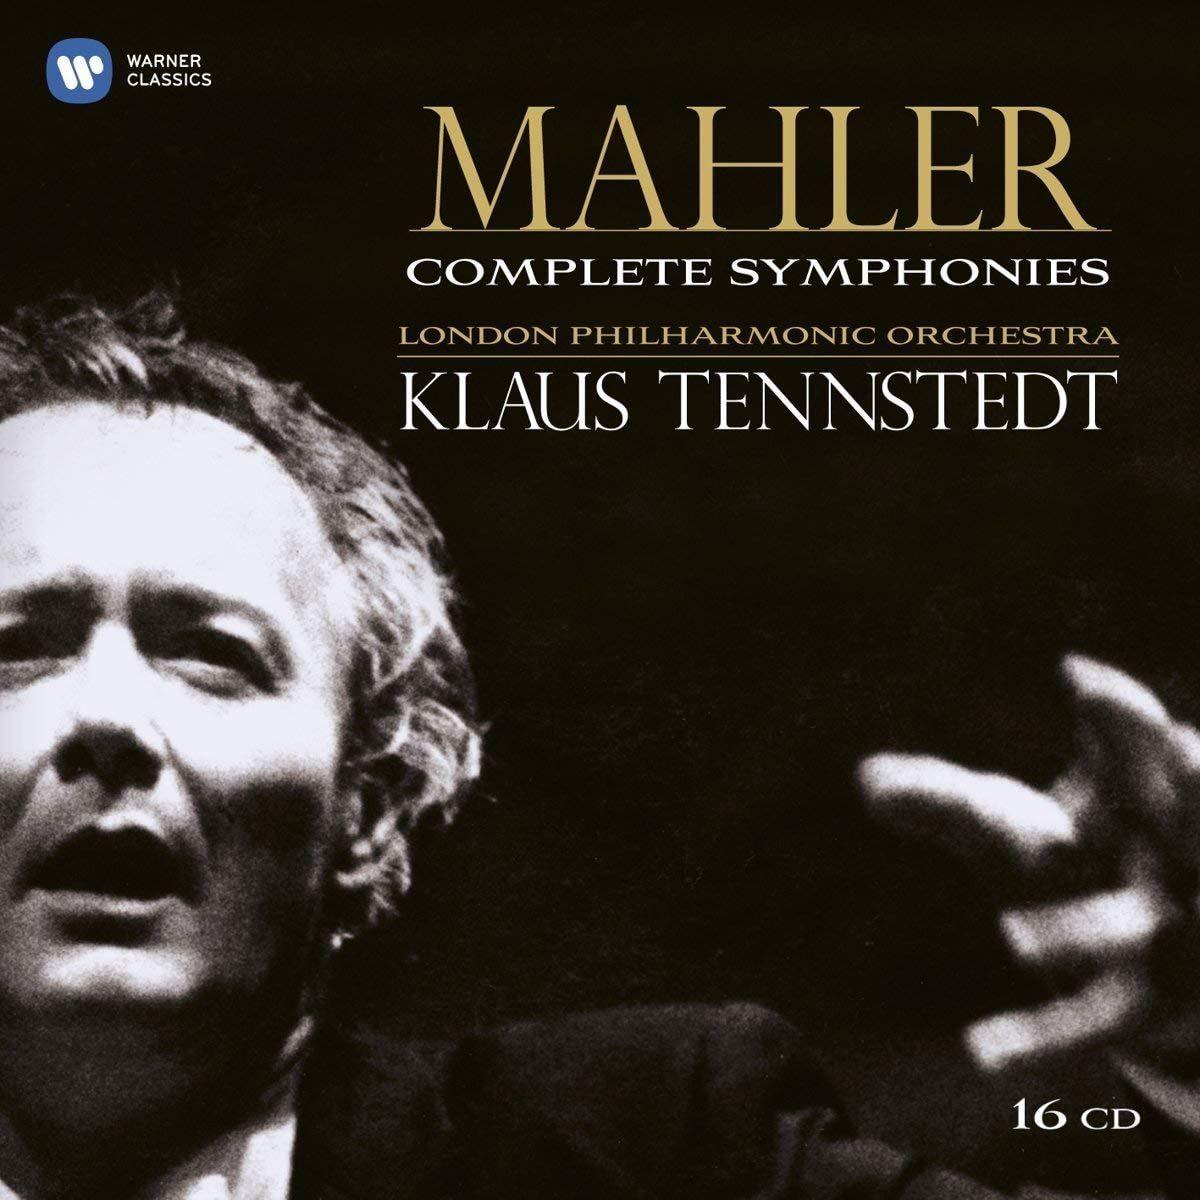 Klaus Tennstedt conducts Mahler Symphonies